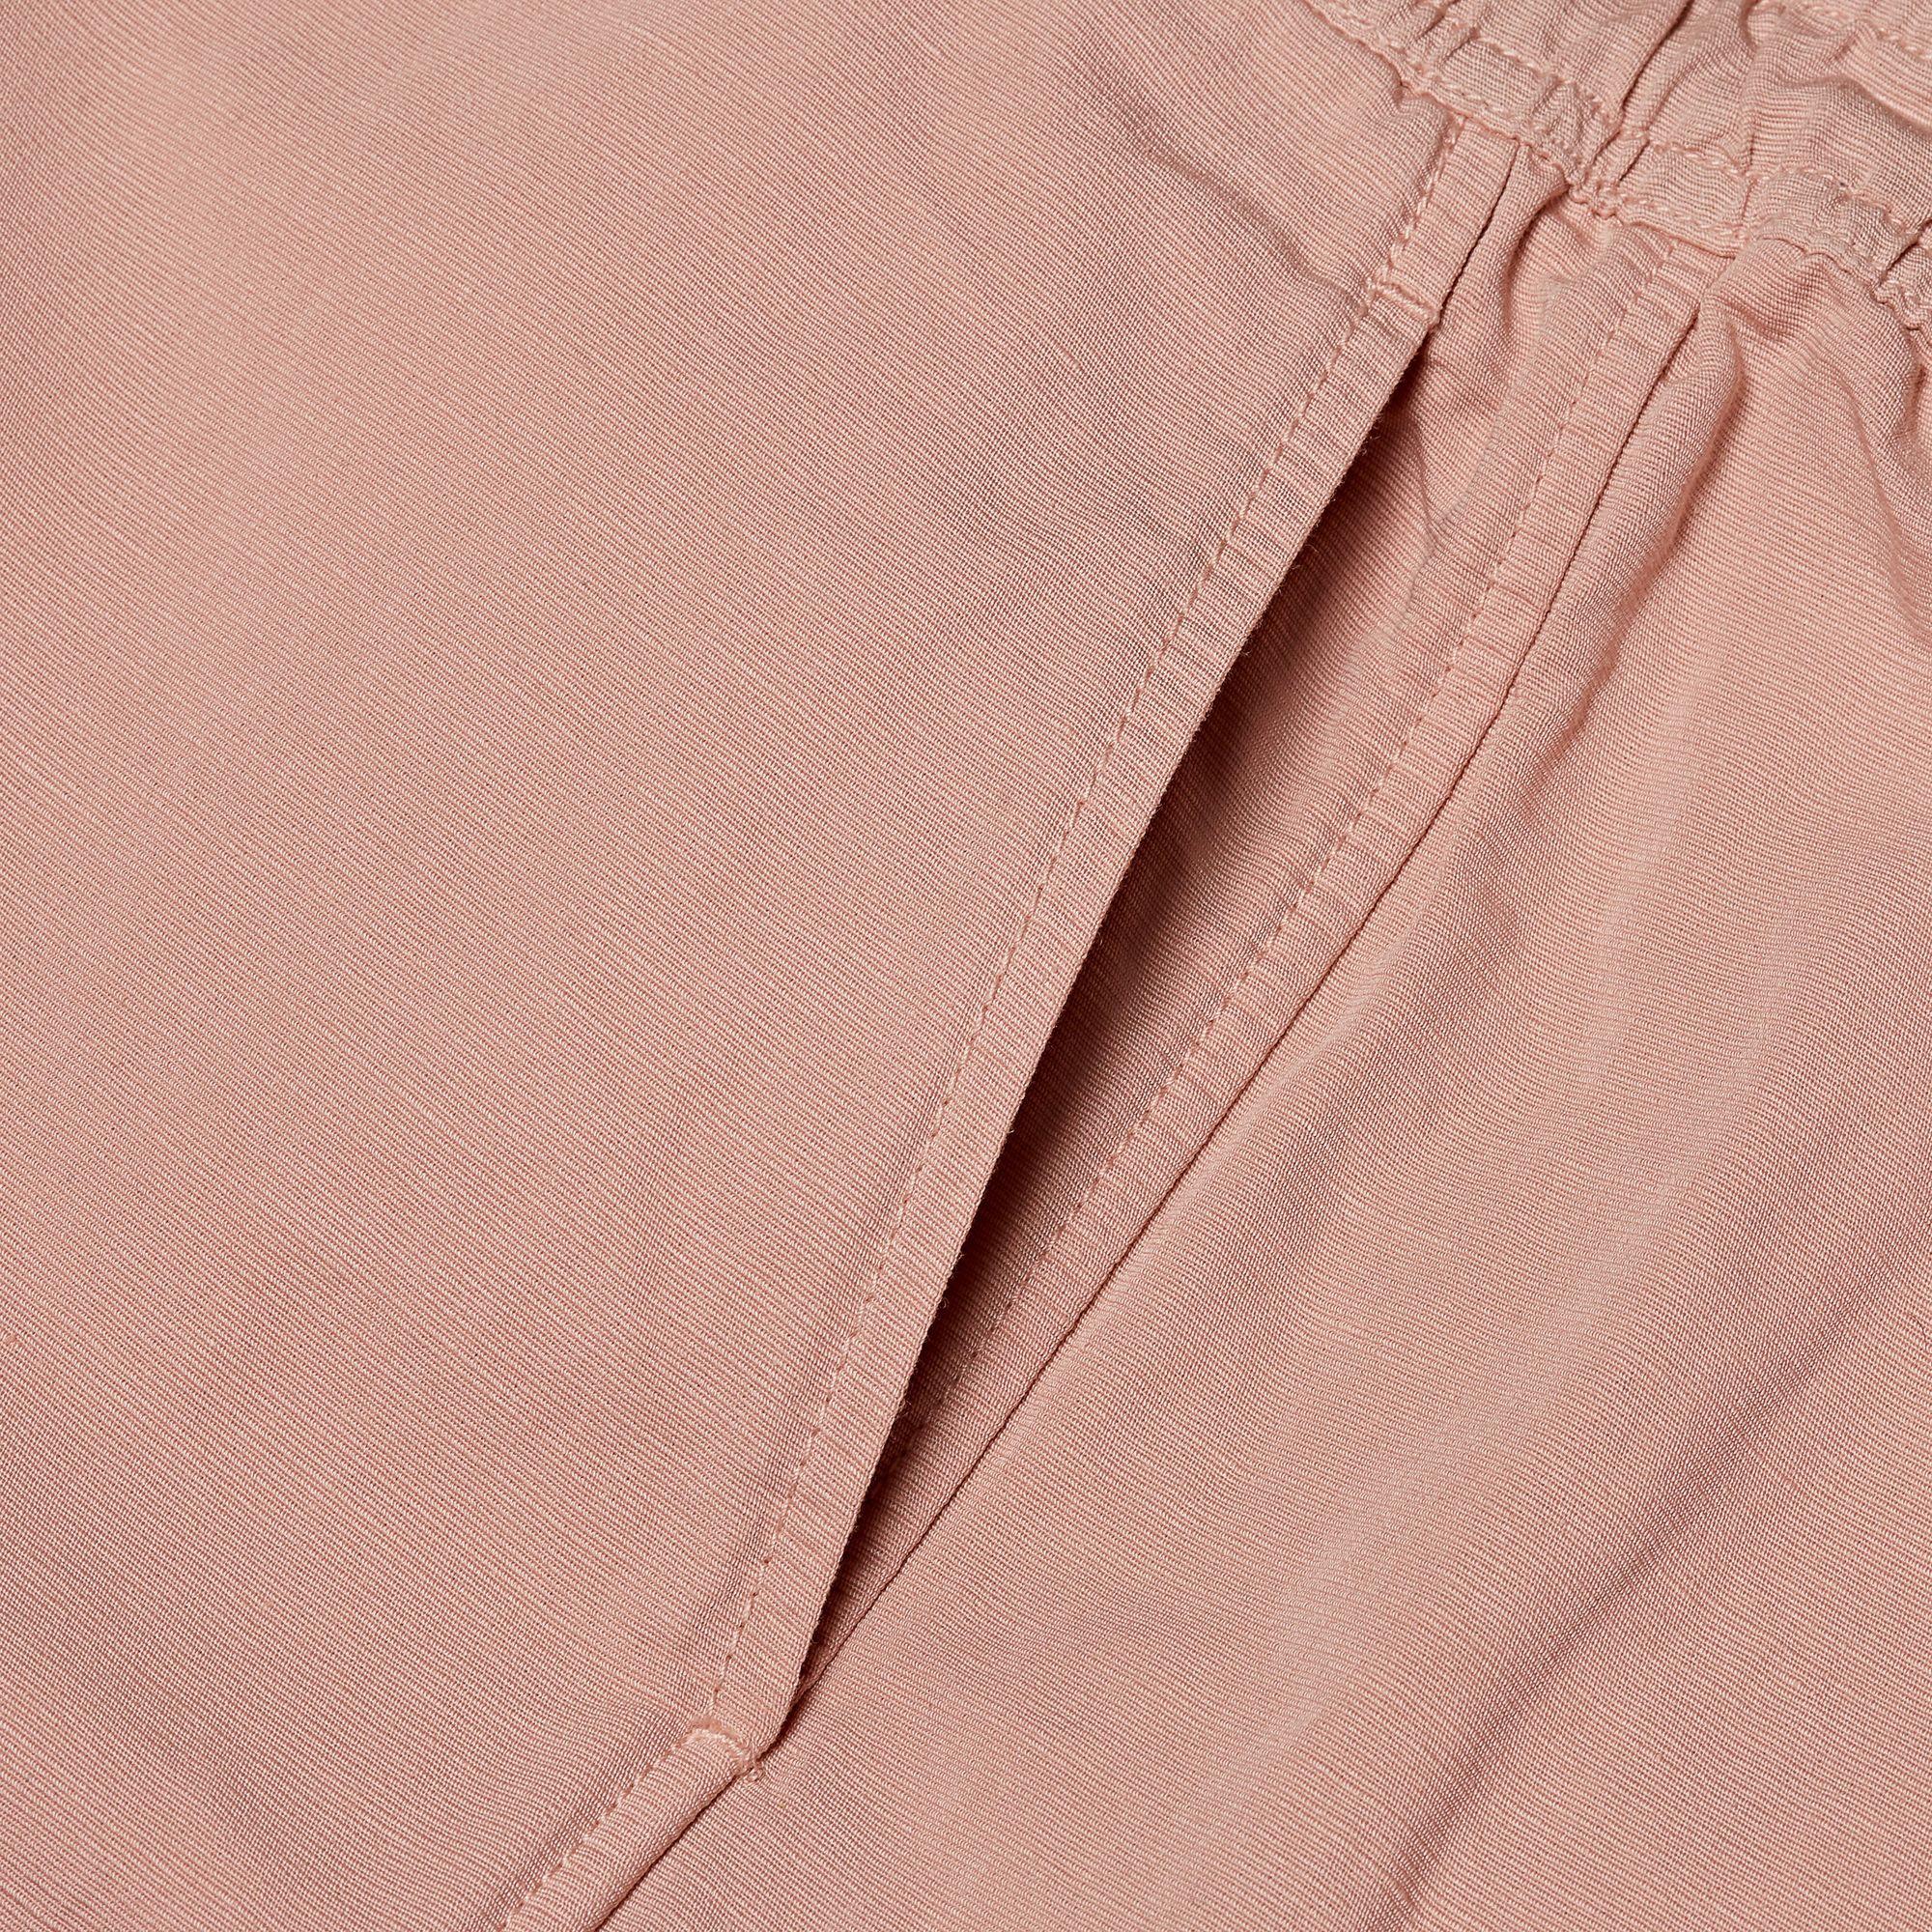 Orlebar Brown Bulldog Cotton Linen